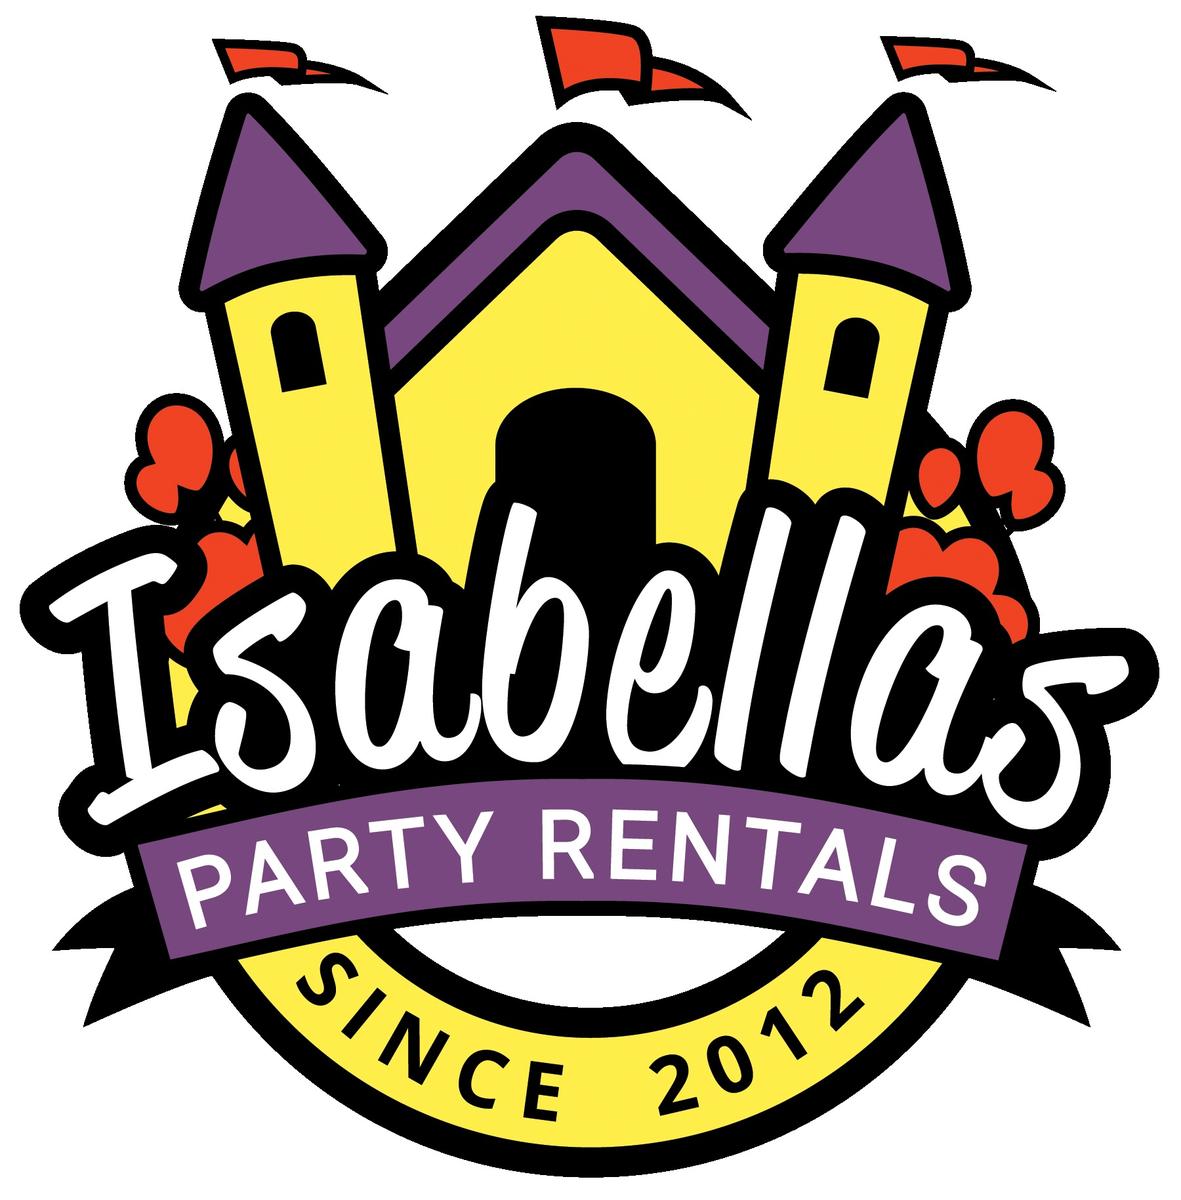 Isabellas Party Rentals Wedding Event Rentals